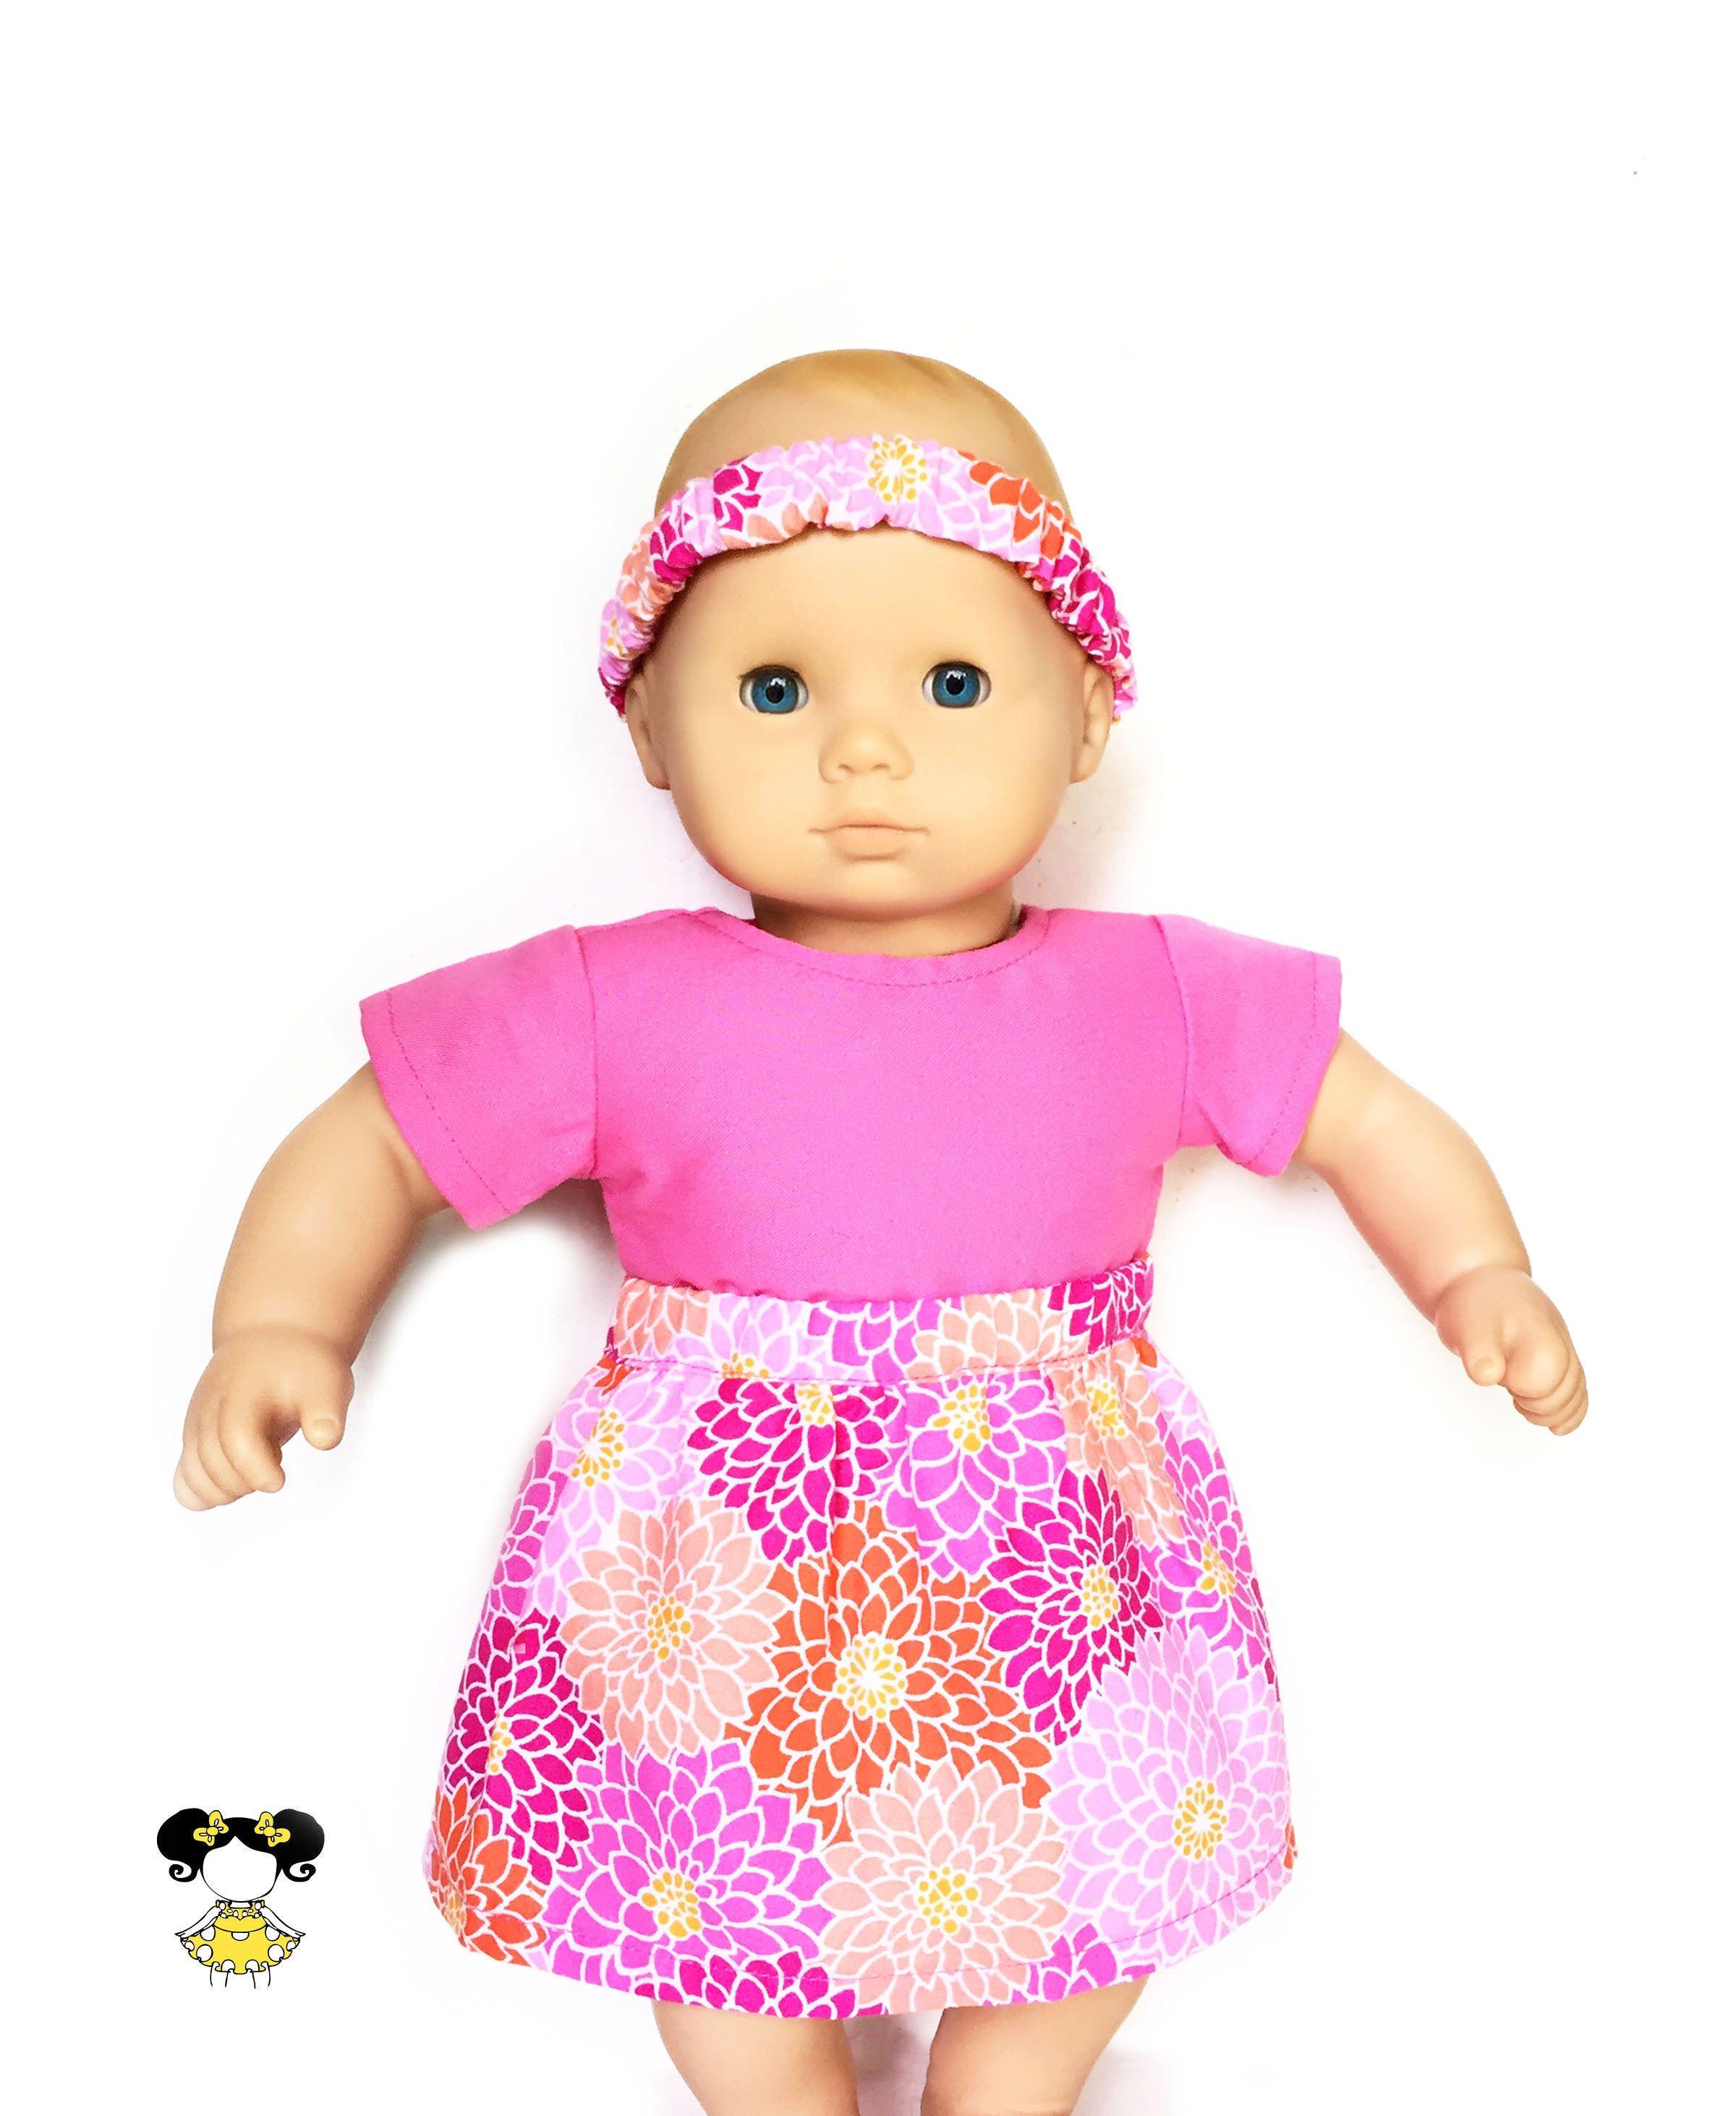 Flare Skirt Flowers Headband Pink Orange White Fits dolls such